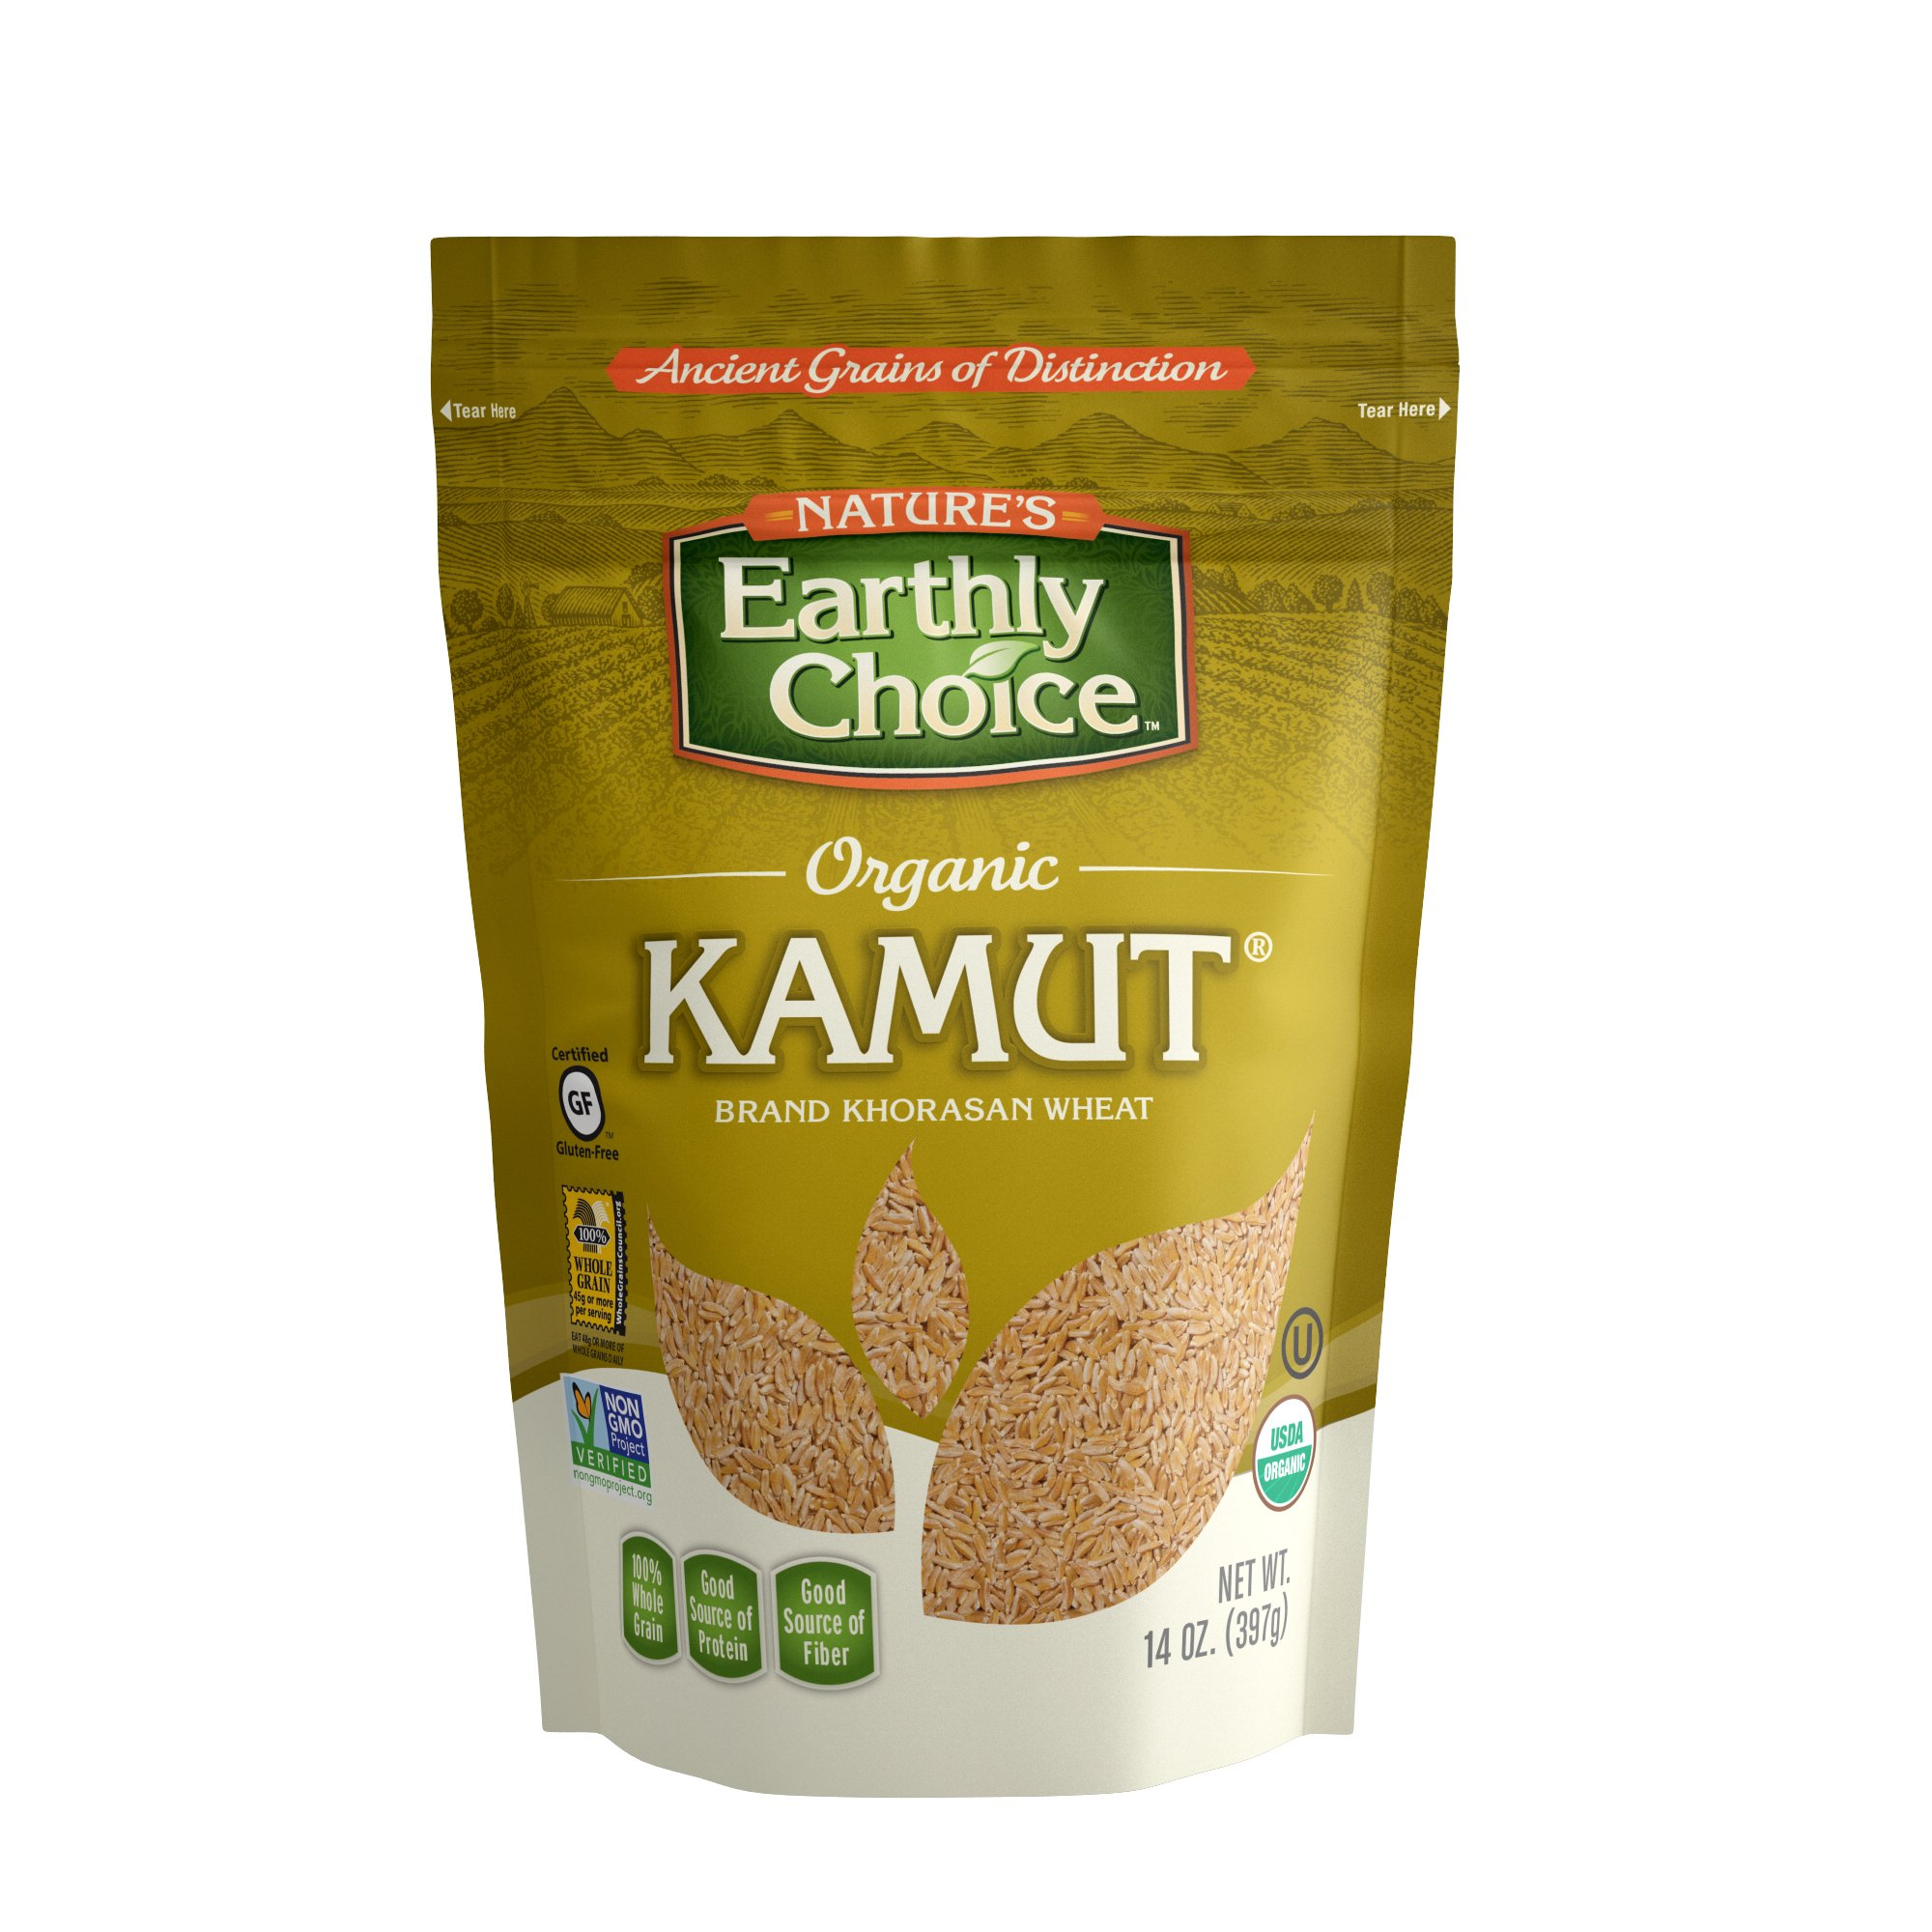 Nature's Earthly Choice Organic Premium Kamut Brand Khorasan Wheat, 14 Ounce